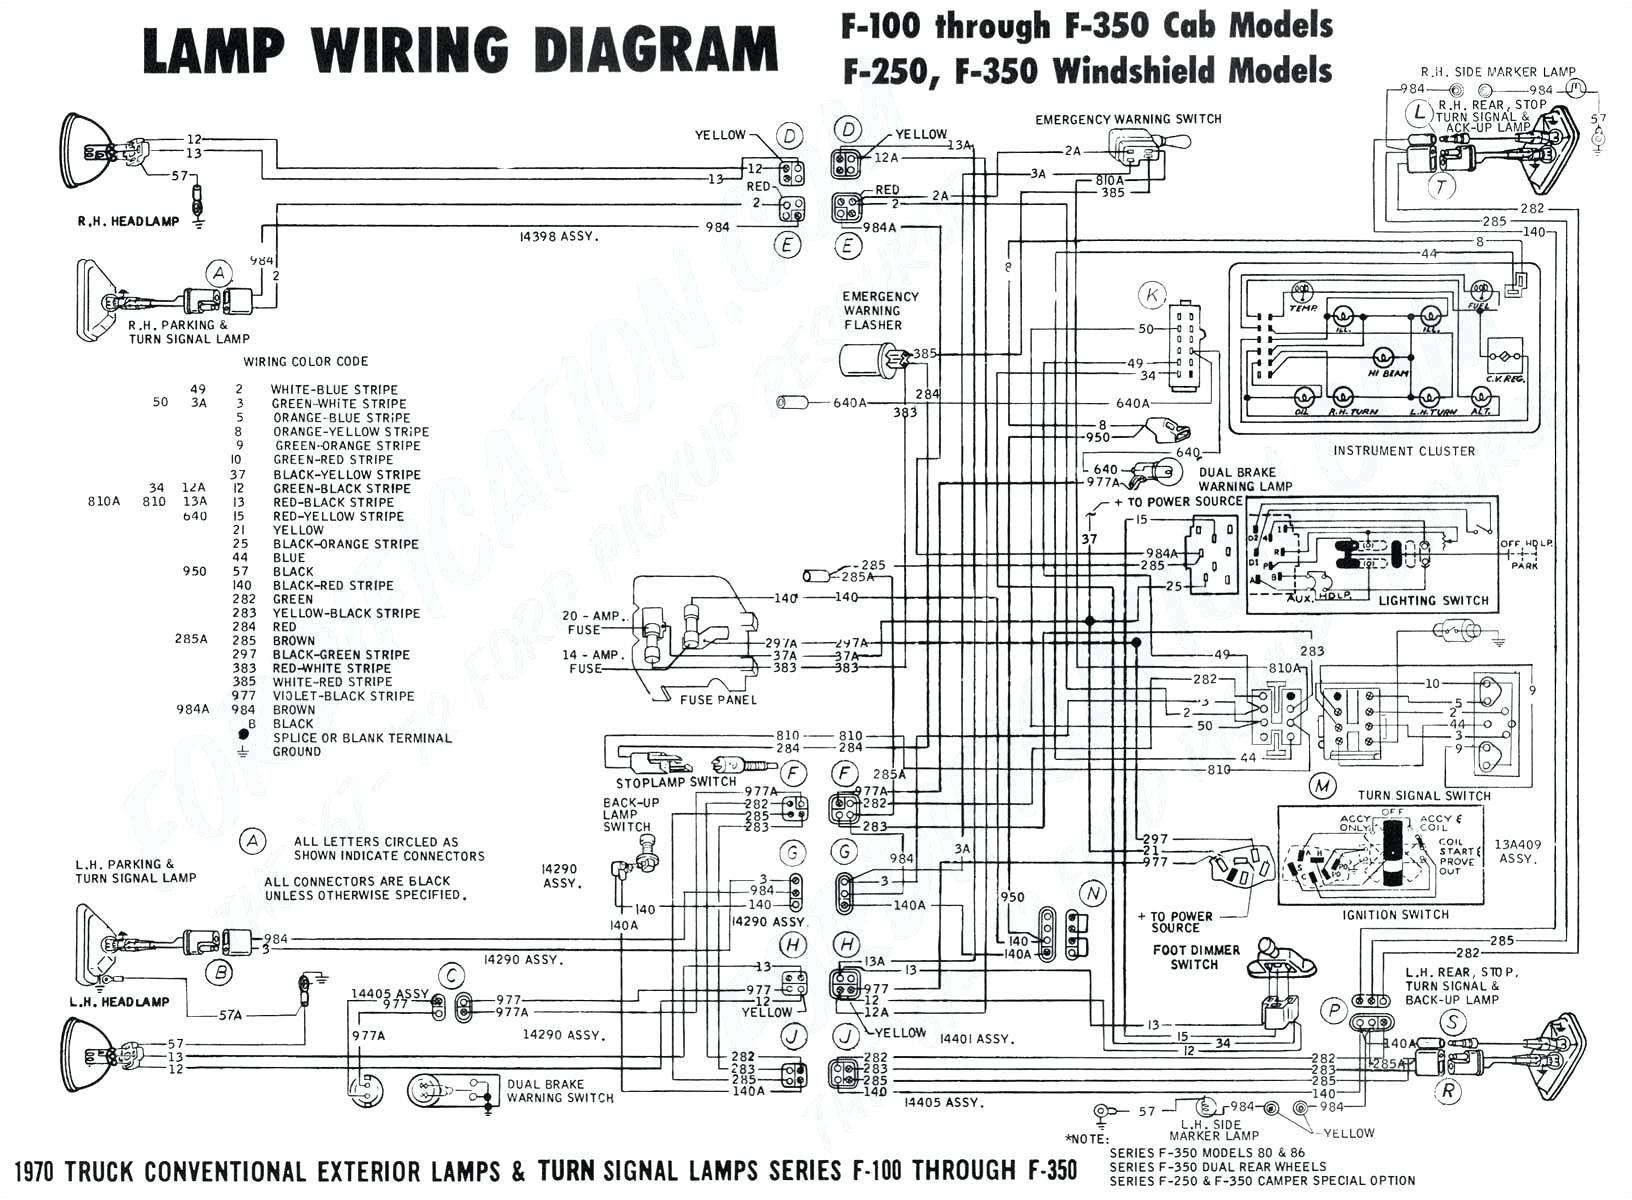 Chrysler Crossfire Wiring Diagram 2 2l Diagram Engine toyotavan1988engine My Wiring Diagram